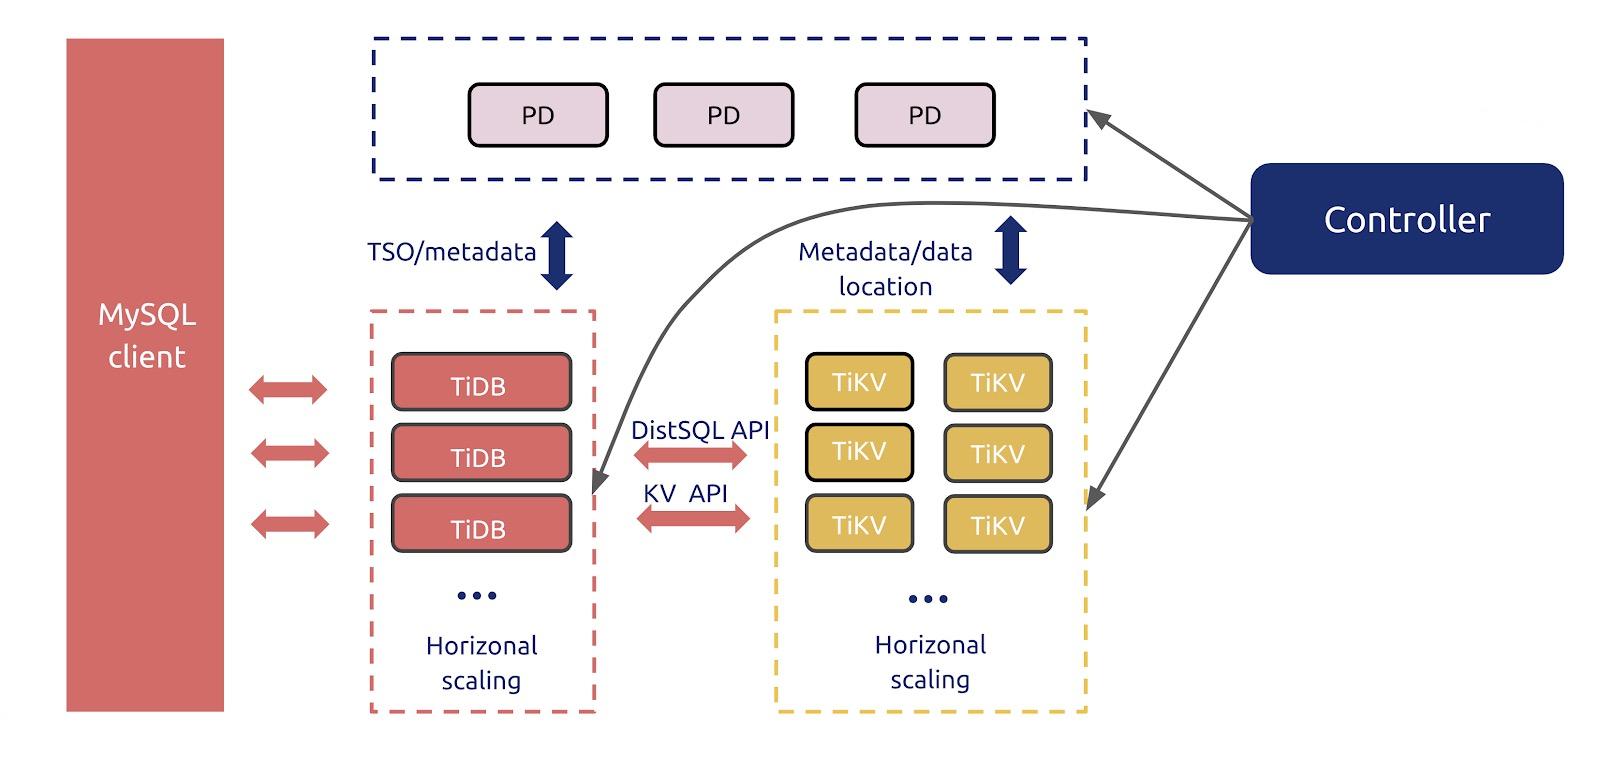 TiDB Operator auto-scales the cluster